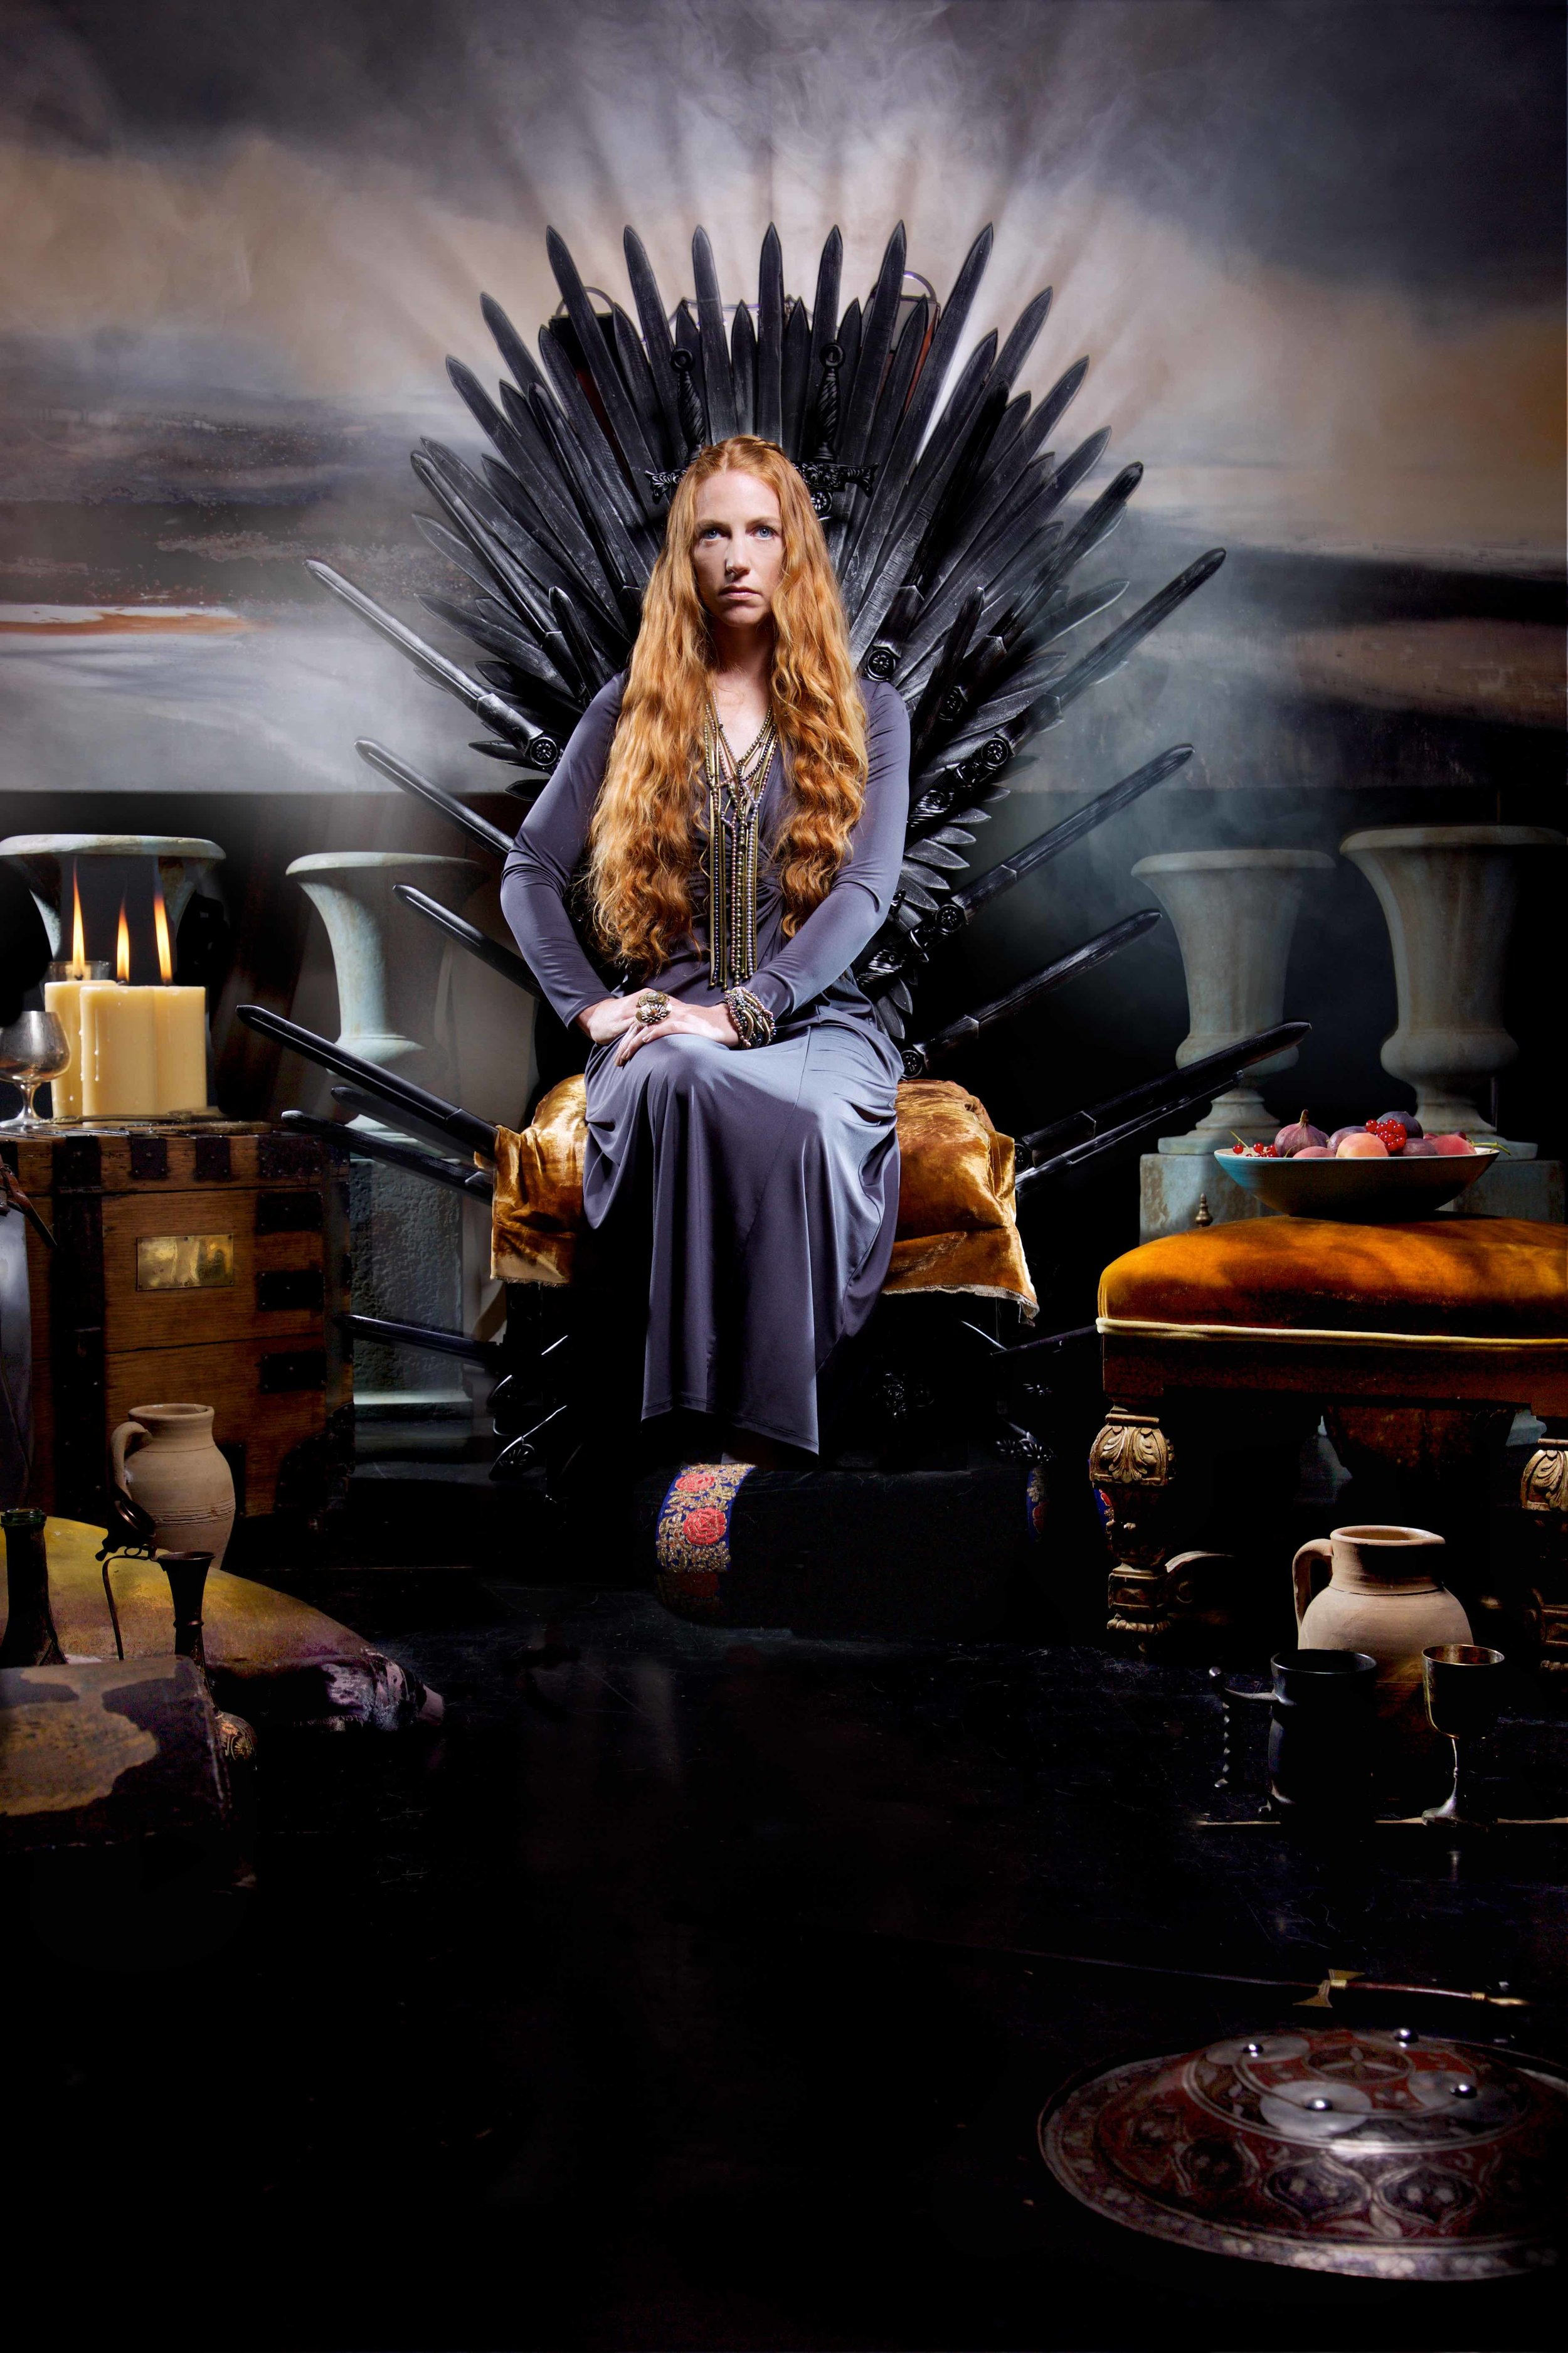 Game of Thrones The Bath Magazine © Marc Aitken 2016 42016-09-062016.jpg